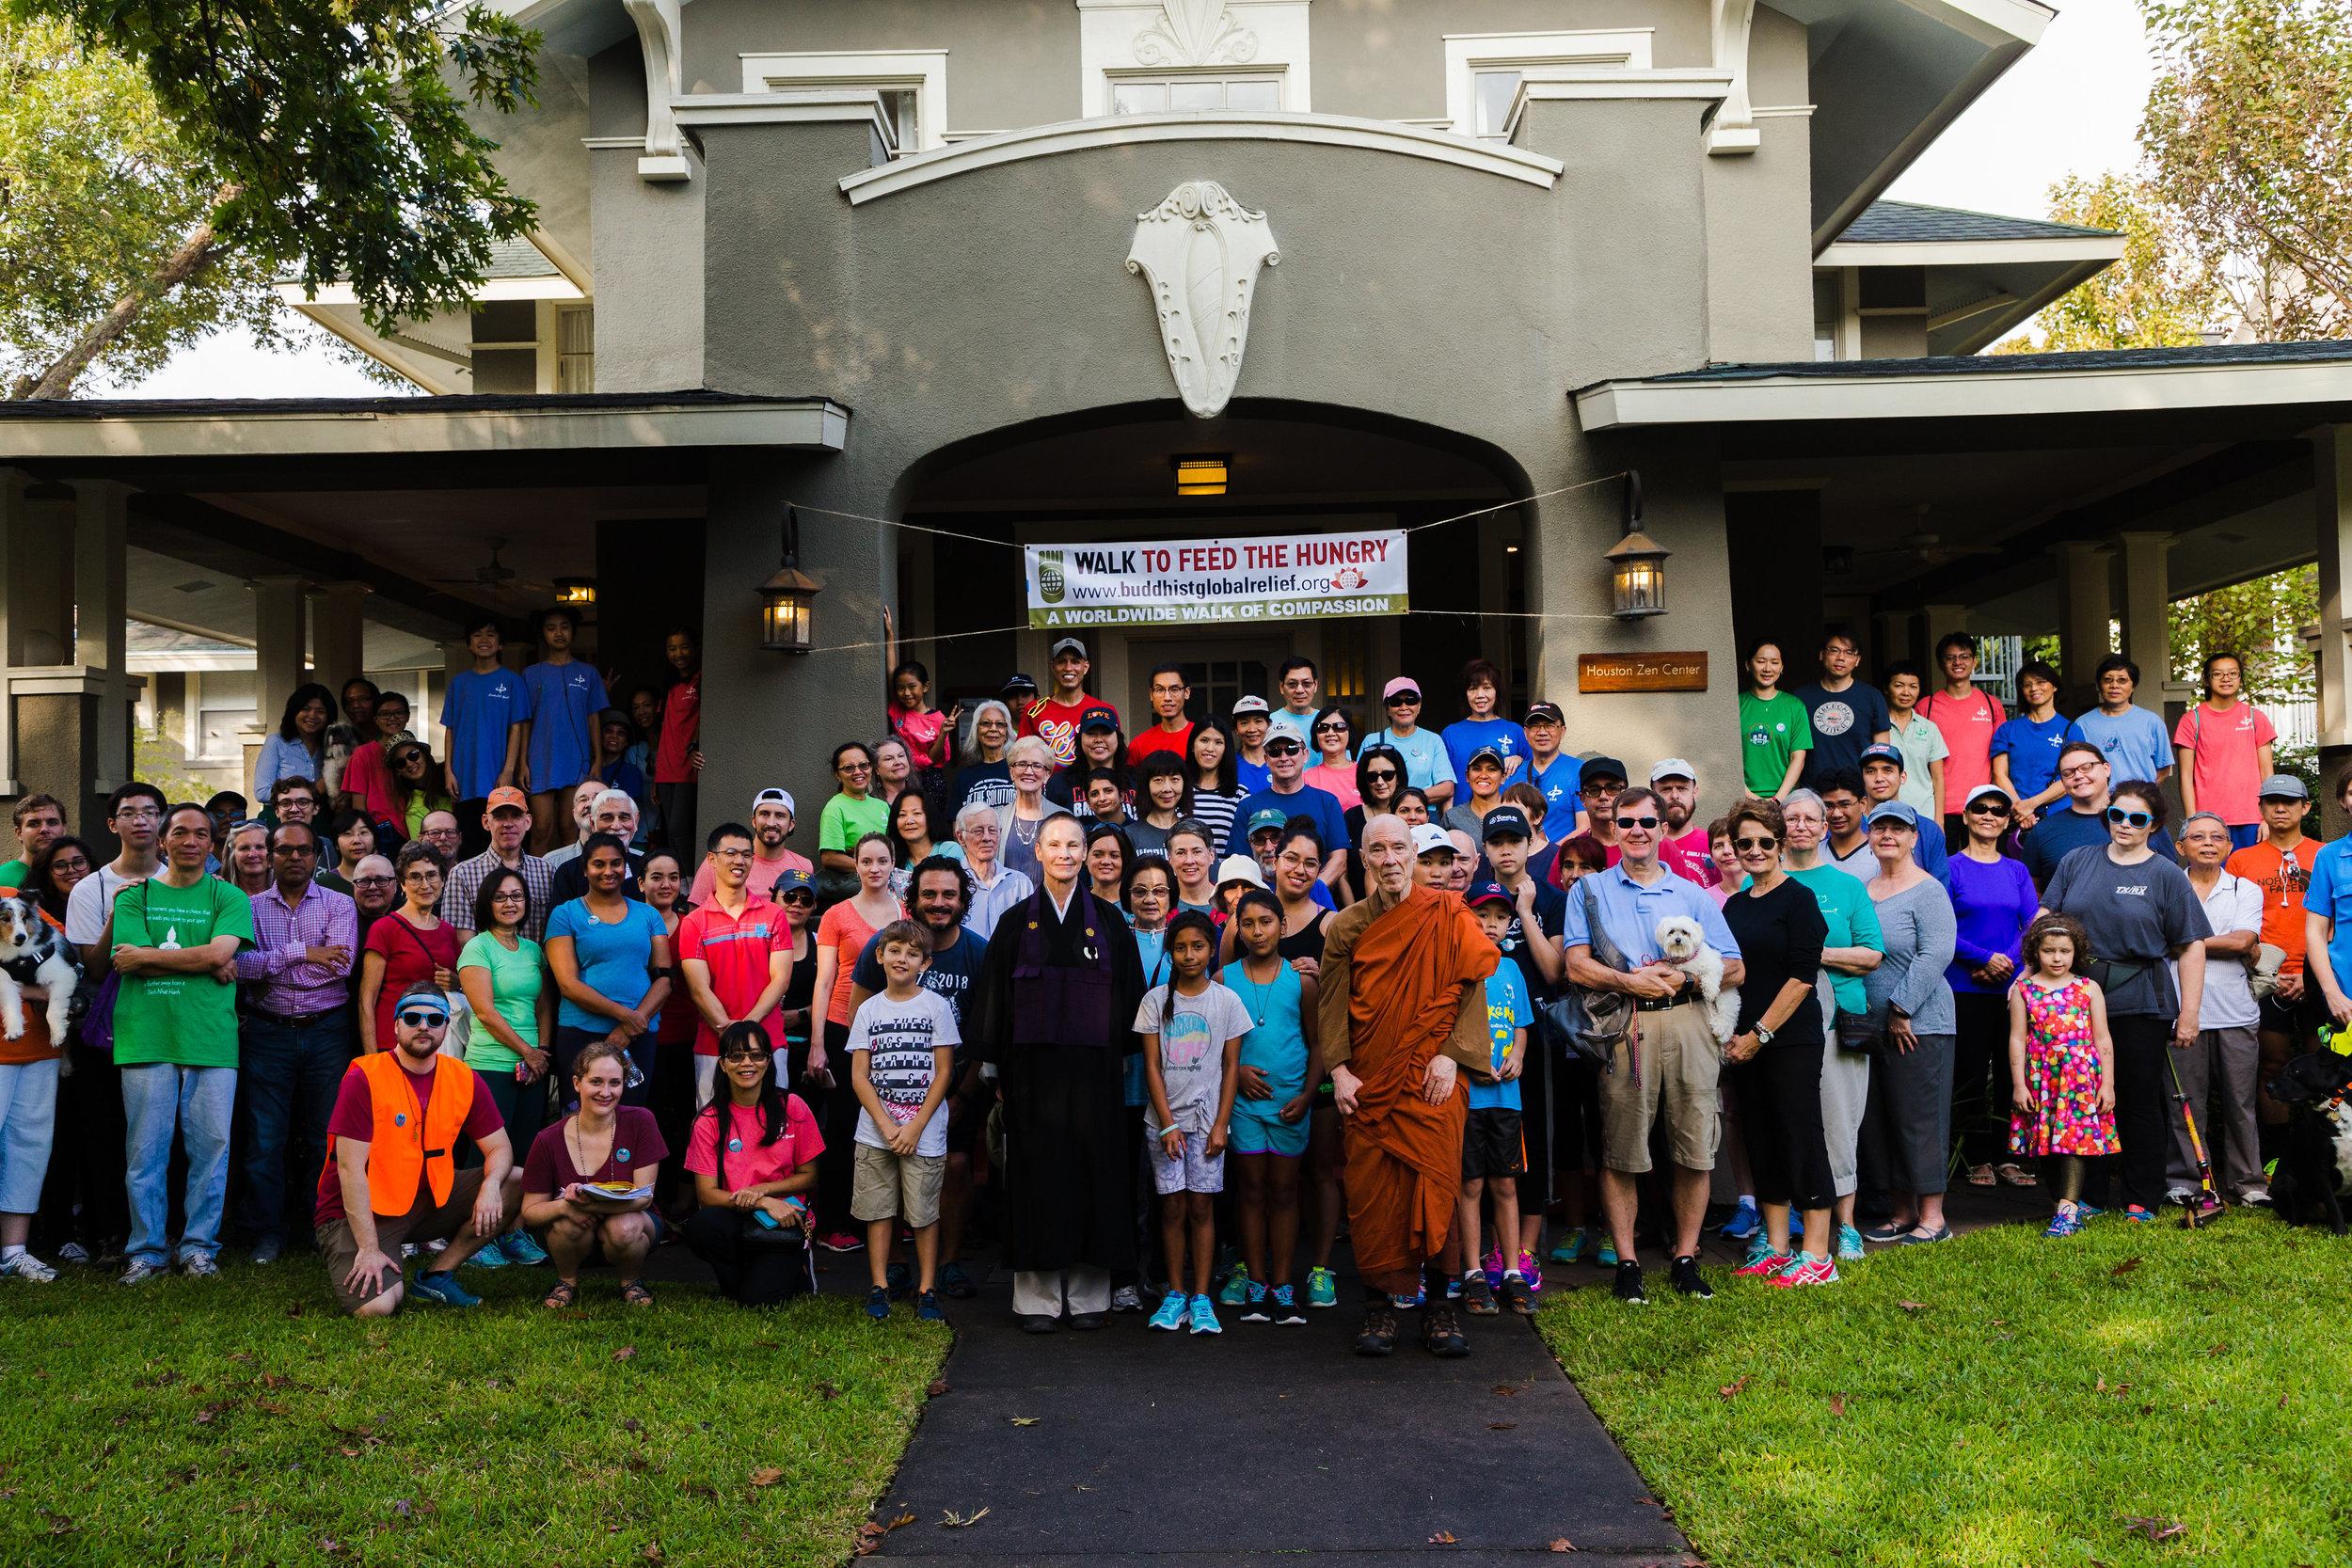 Bhikkhu-Bodhi-Global-Relief-Houston-Zen-Walk-39.jpg